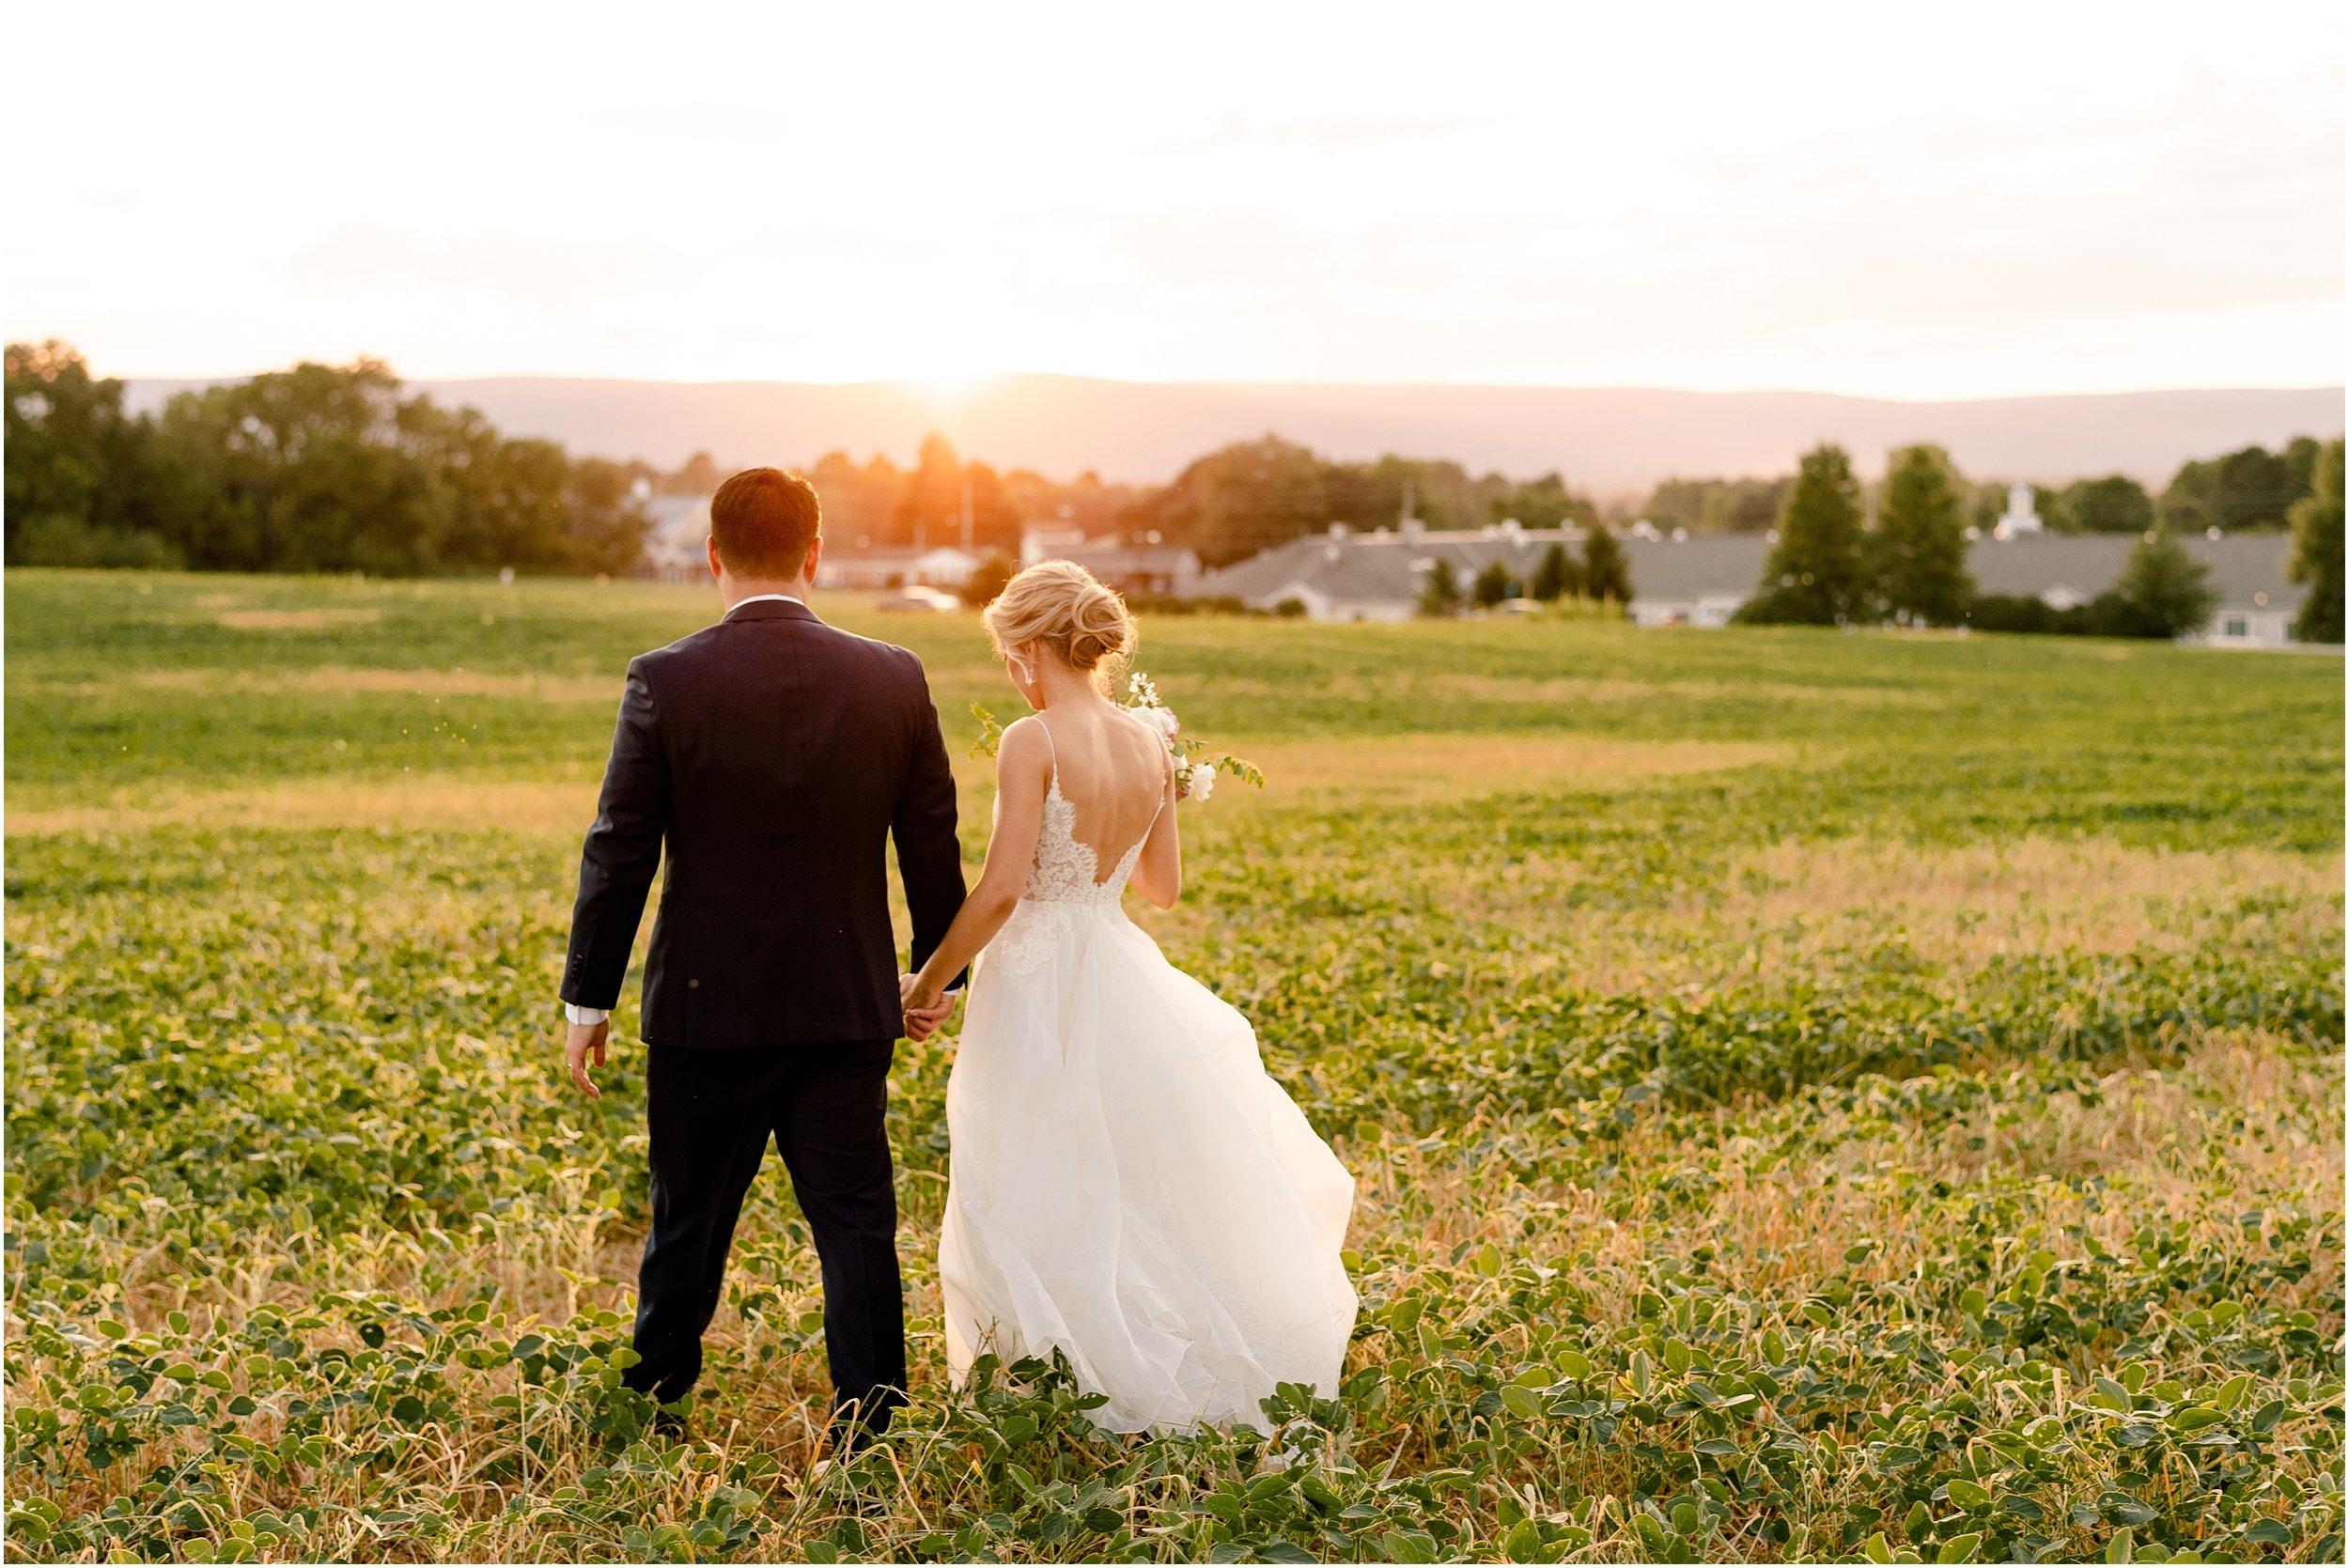 hannah leigh photography Walkers Overlook Wedding Walkersville MD_3565.jpg